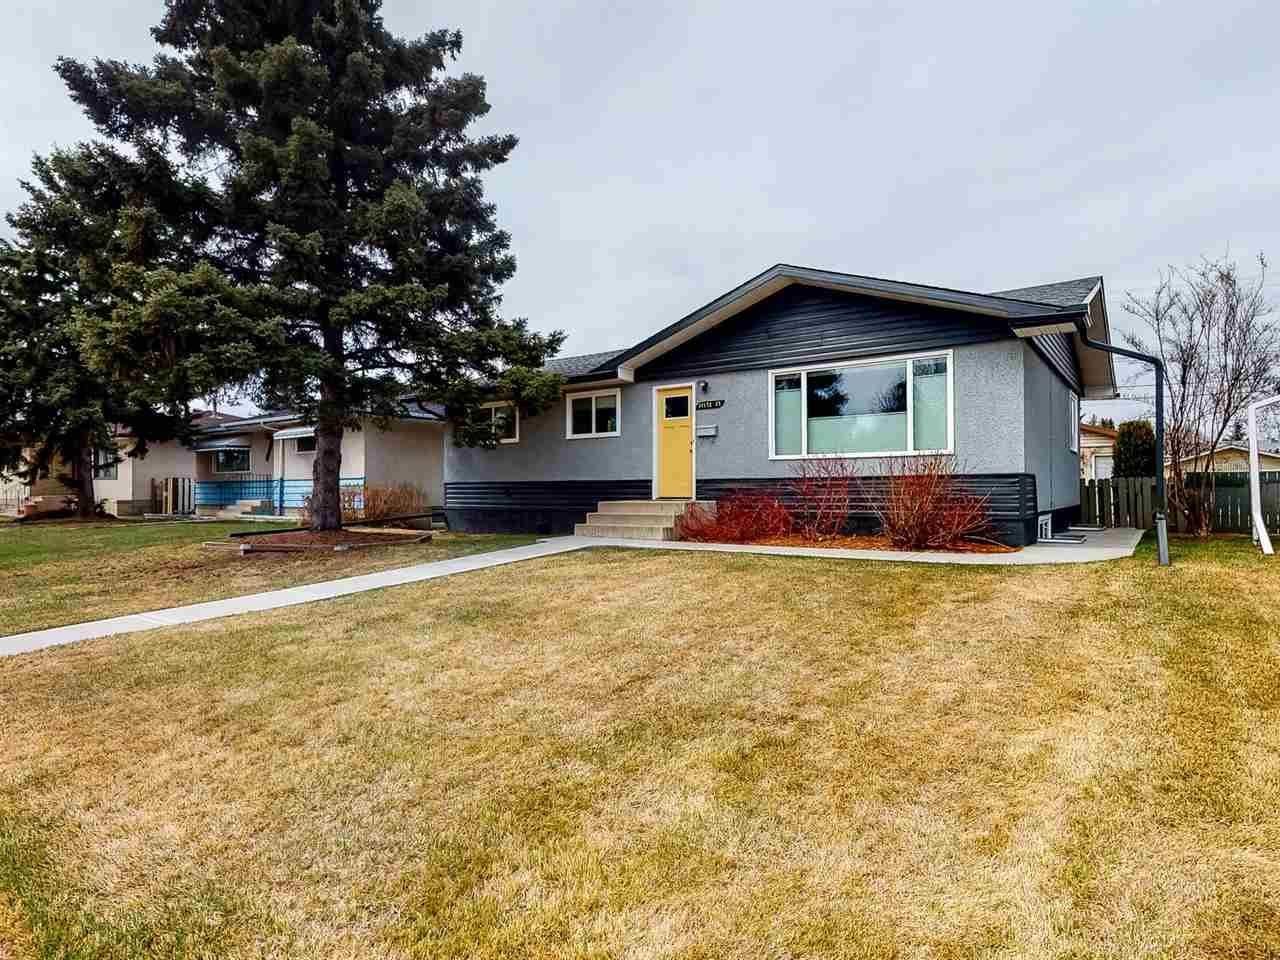 Main Photo: 11172 37 Avenue in Edmonton: Zone 16 House for sale : MLS®# E4241149